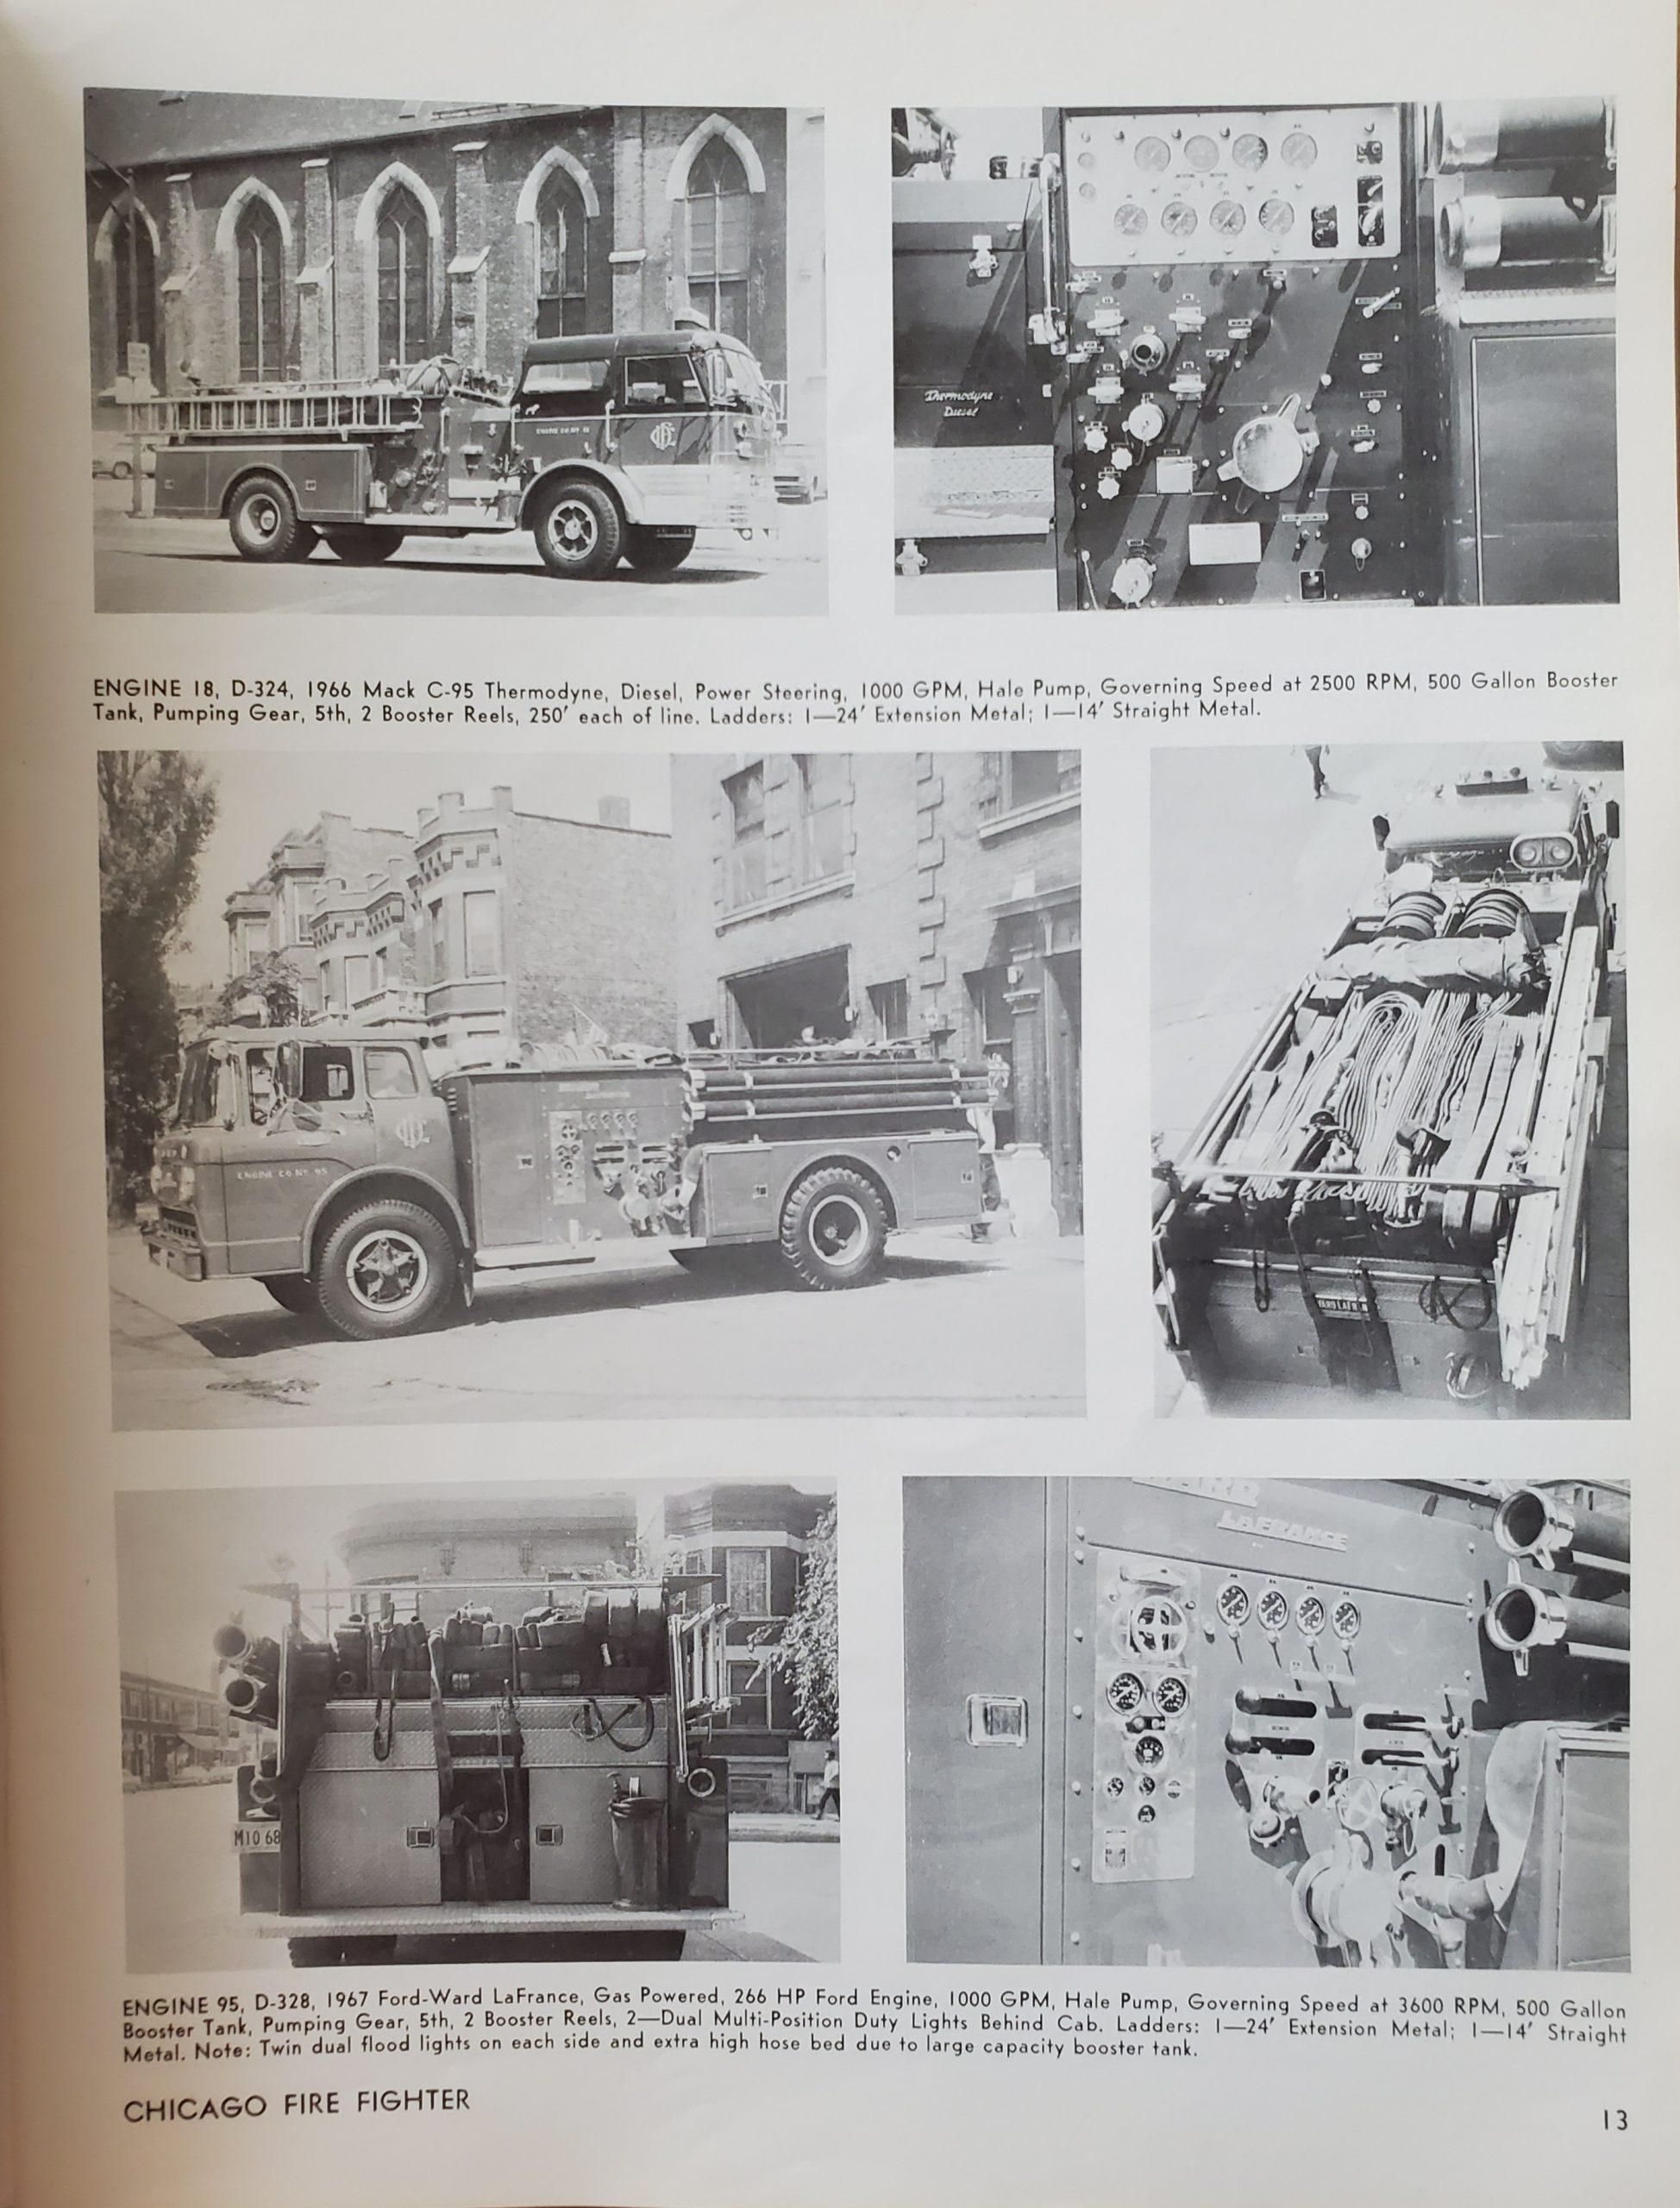 new Chicago fire trucks circa 1967